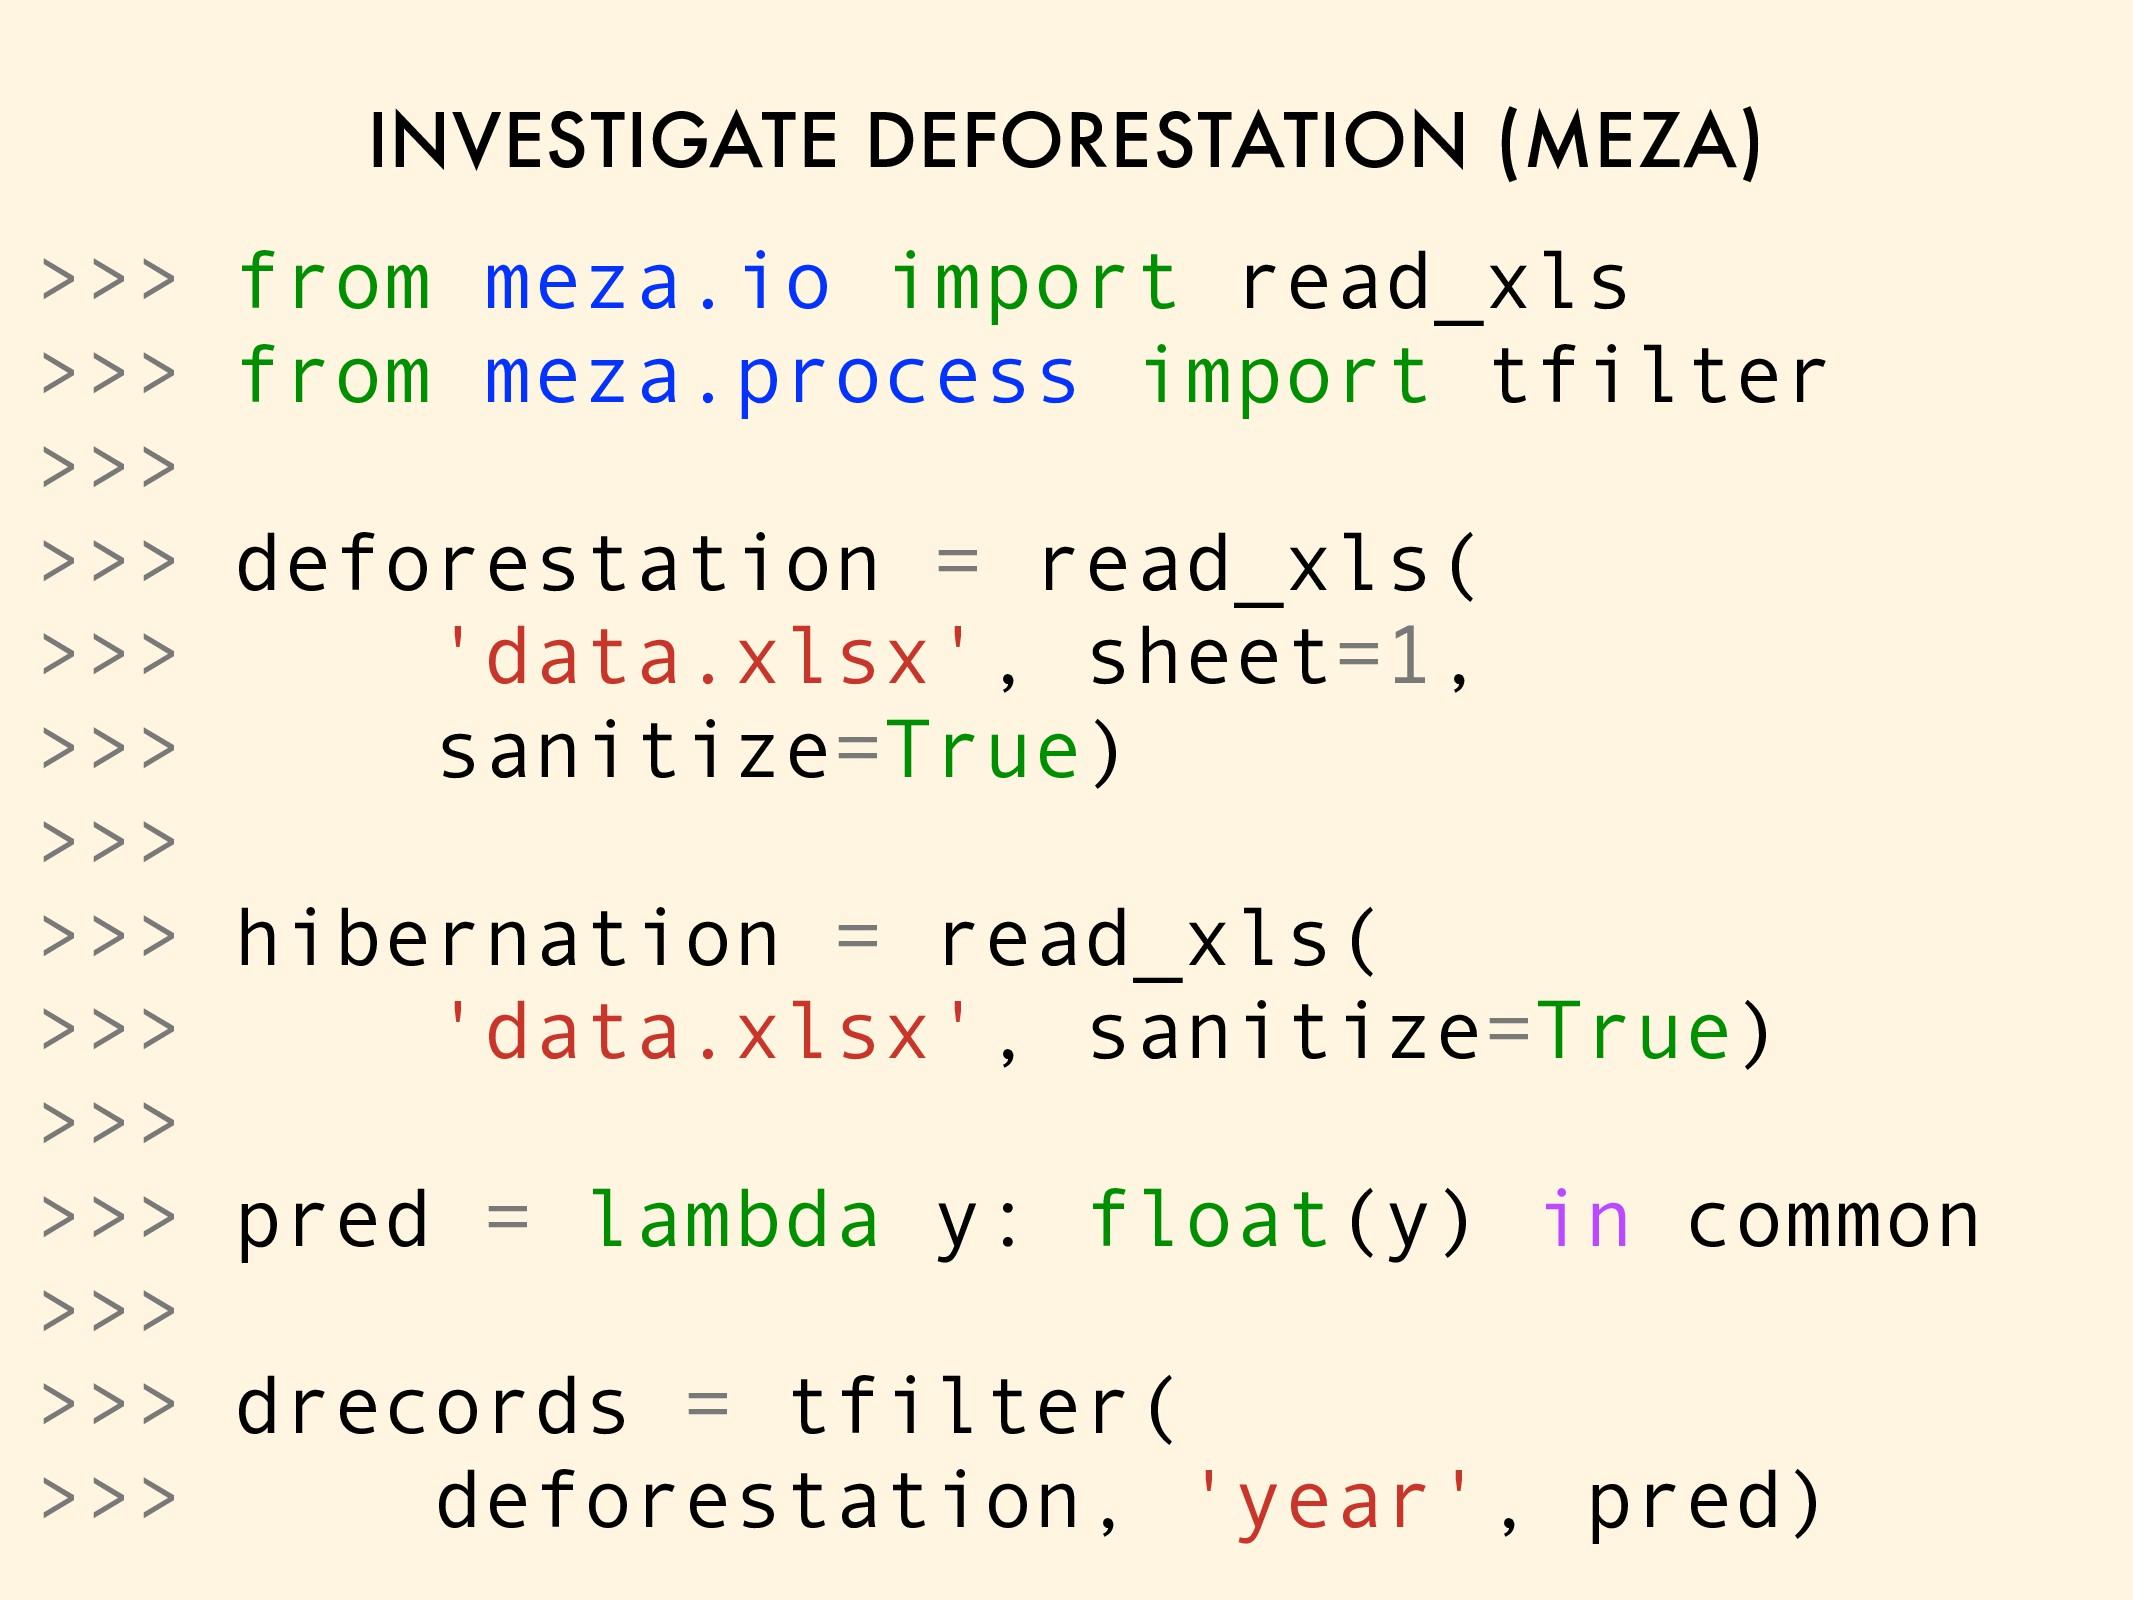 INVESTIGATE DEFORESTATION (MEZA) >>> from meza....